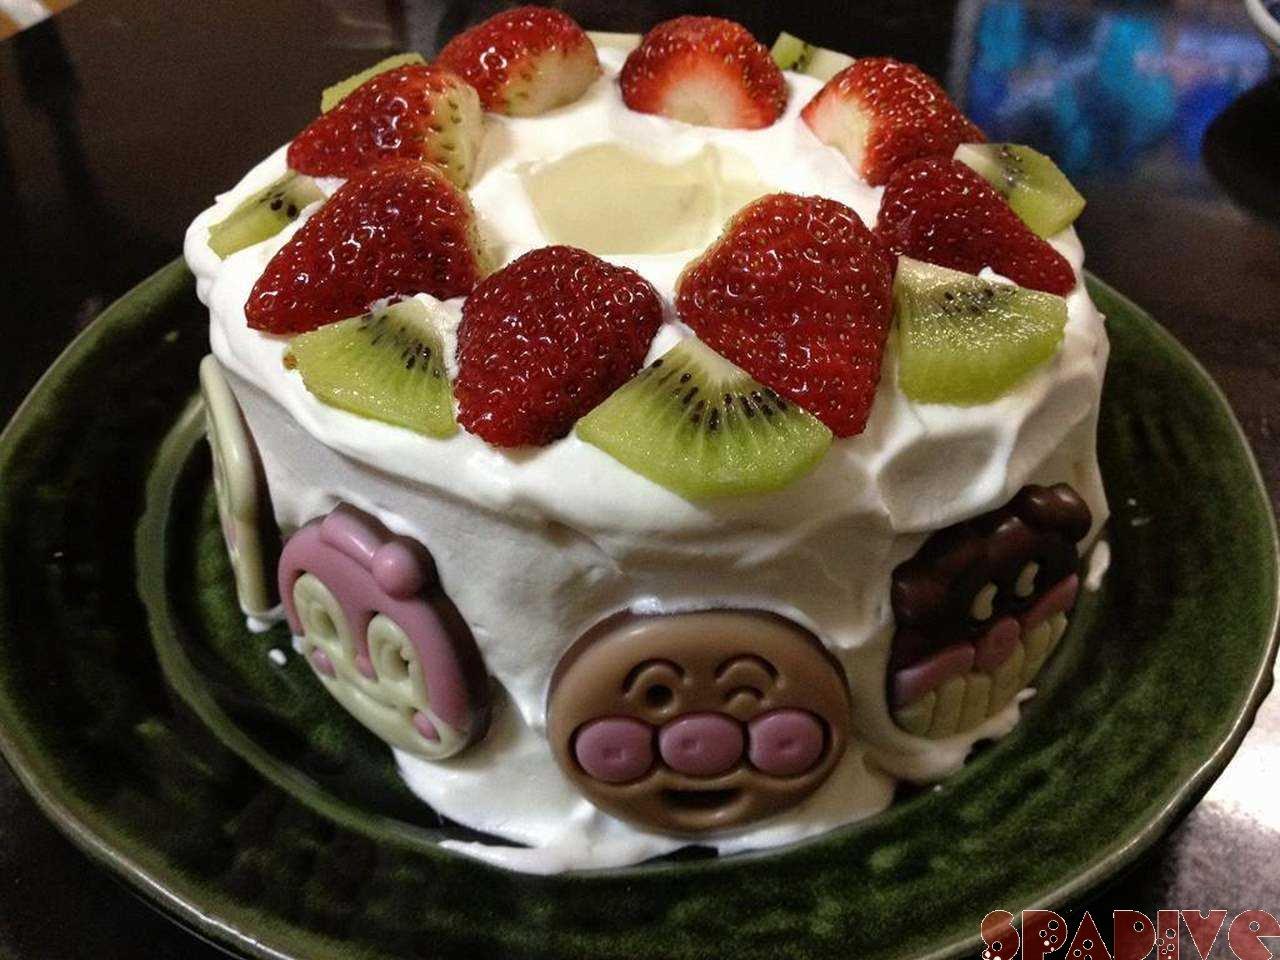 ☆ Merry X'mas ☆|簡易手作りケーキとチキン!12/25/11